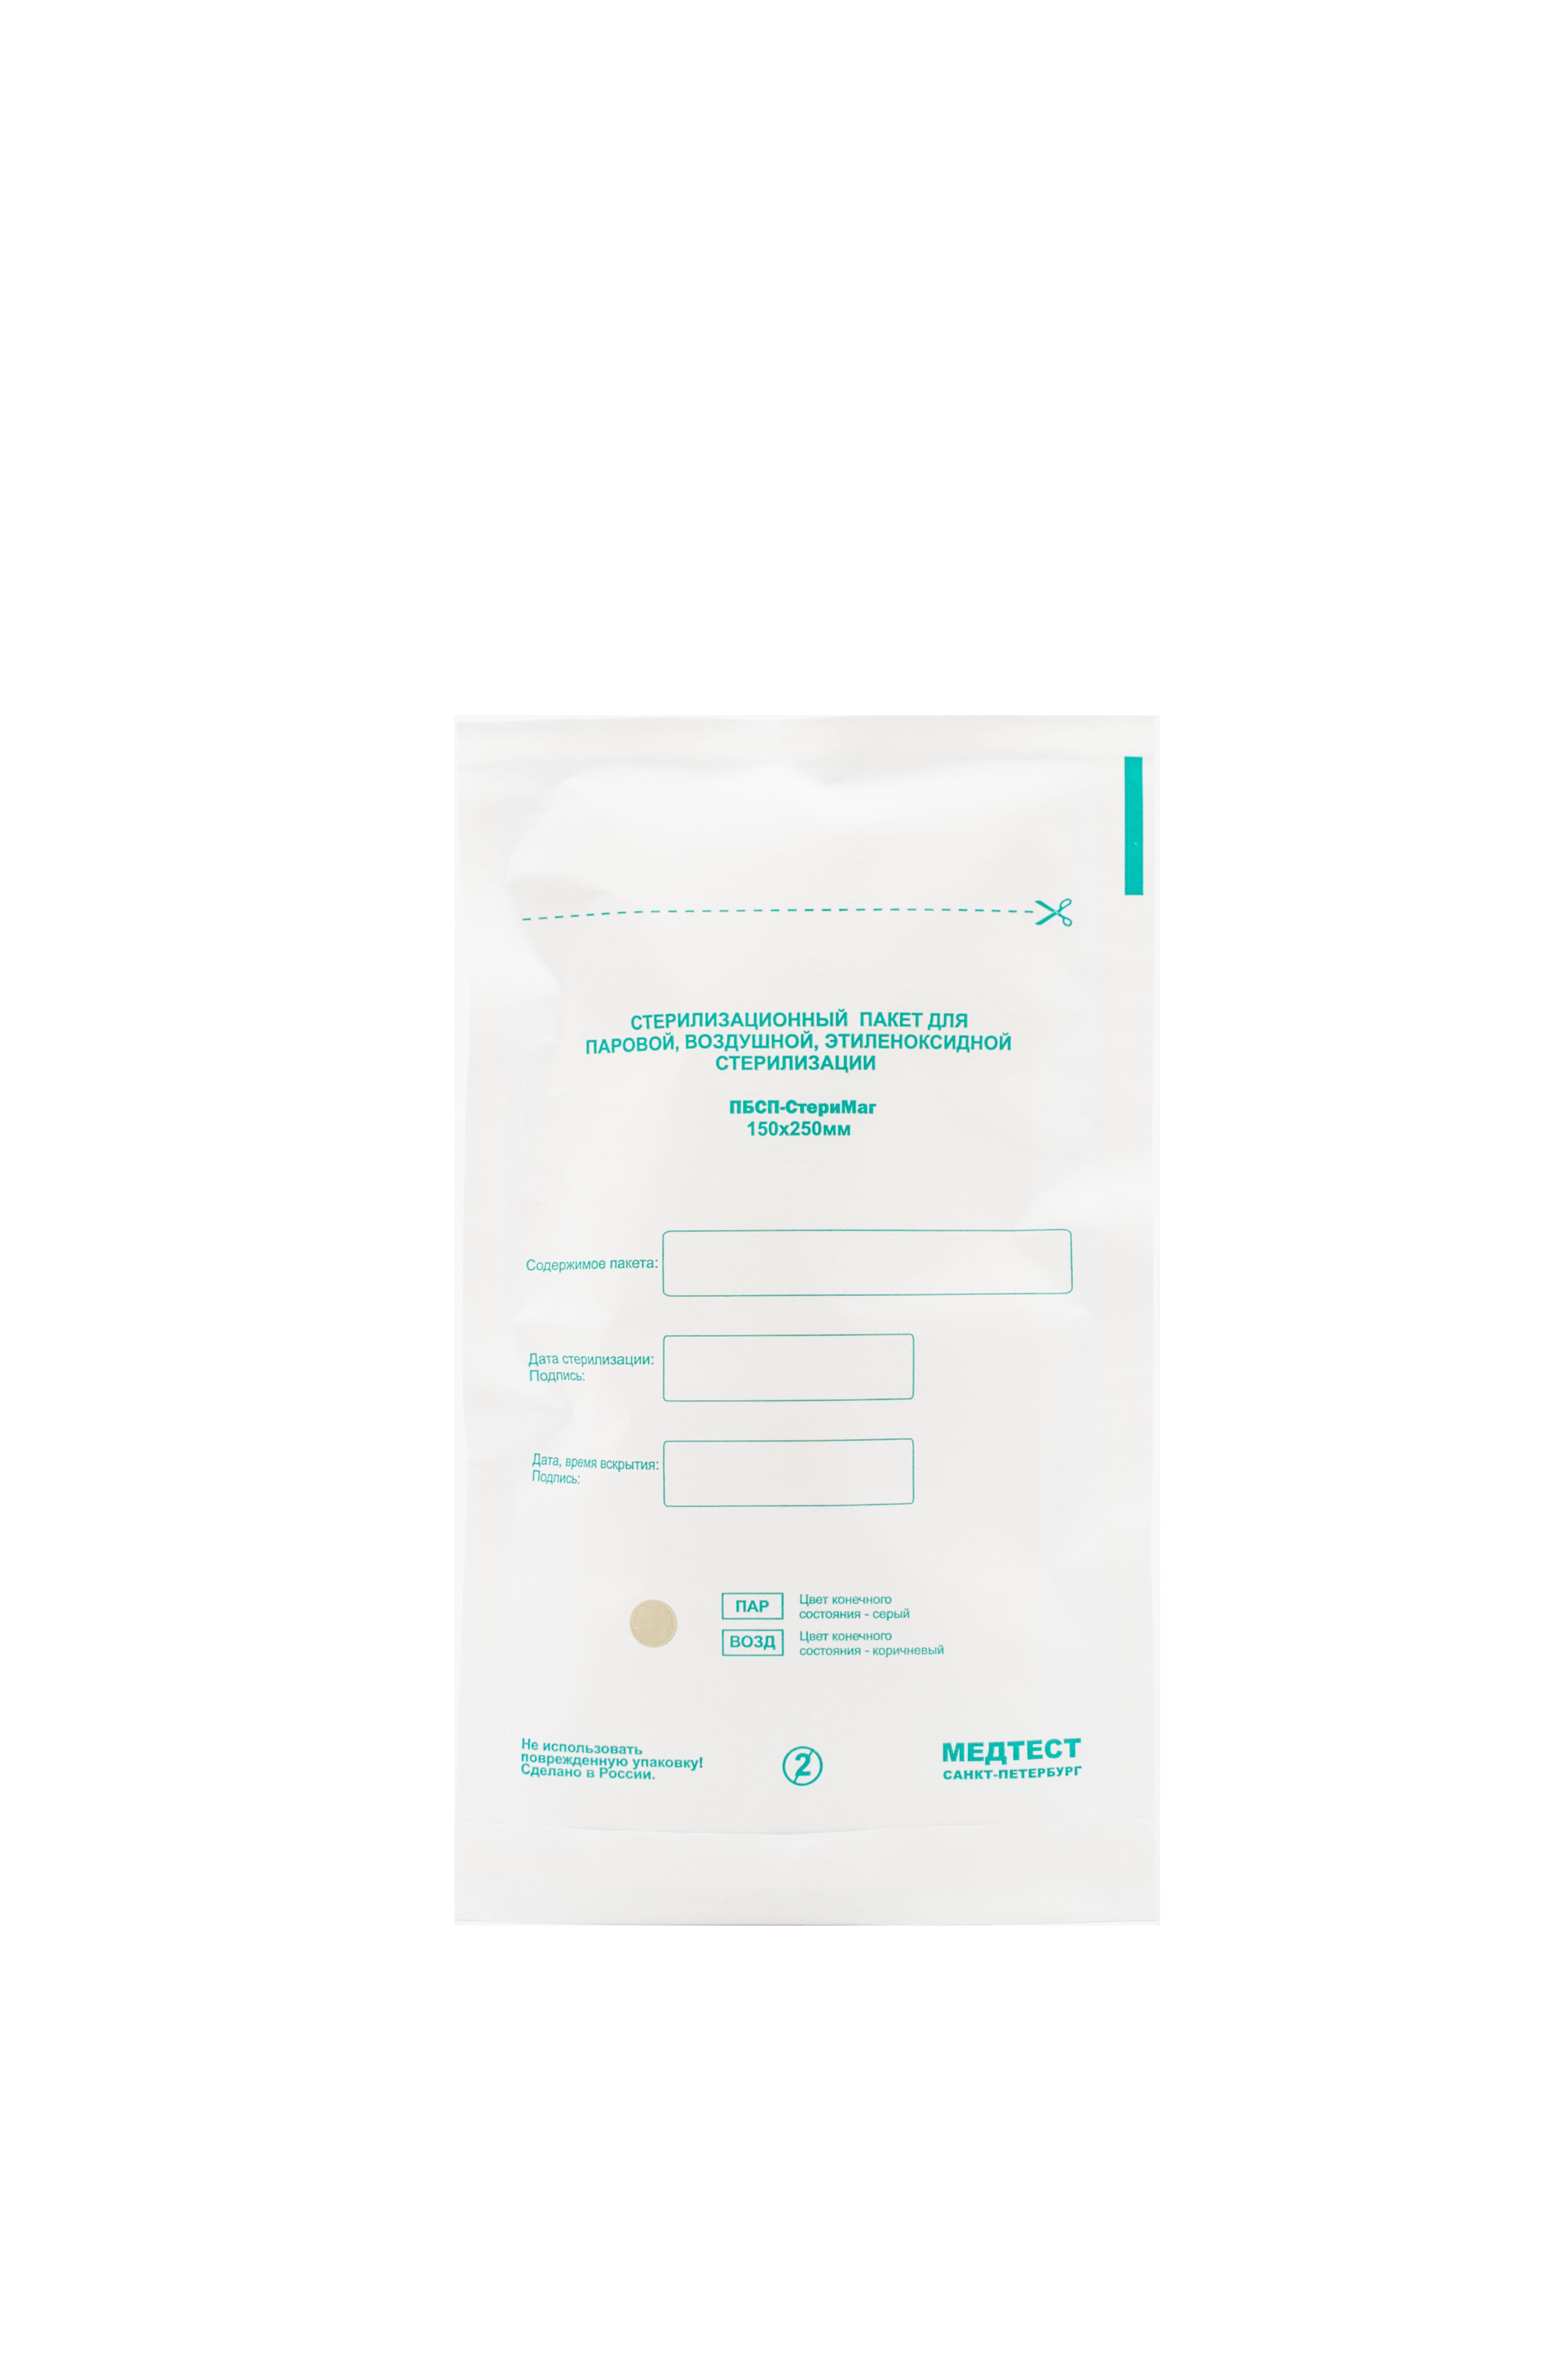 ЧИСТОВЬЕ Крафт-пакет 150*250 мм белый ПБСП-СтеримМаг. 100шт/уп